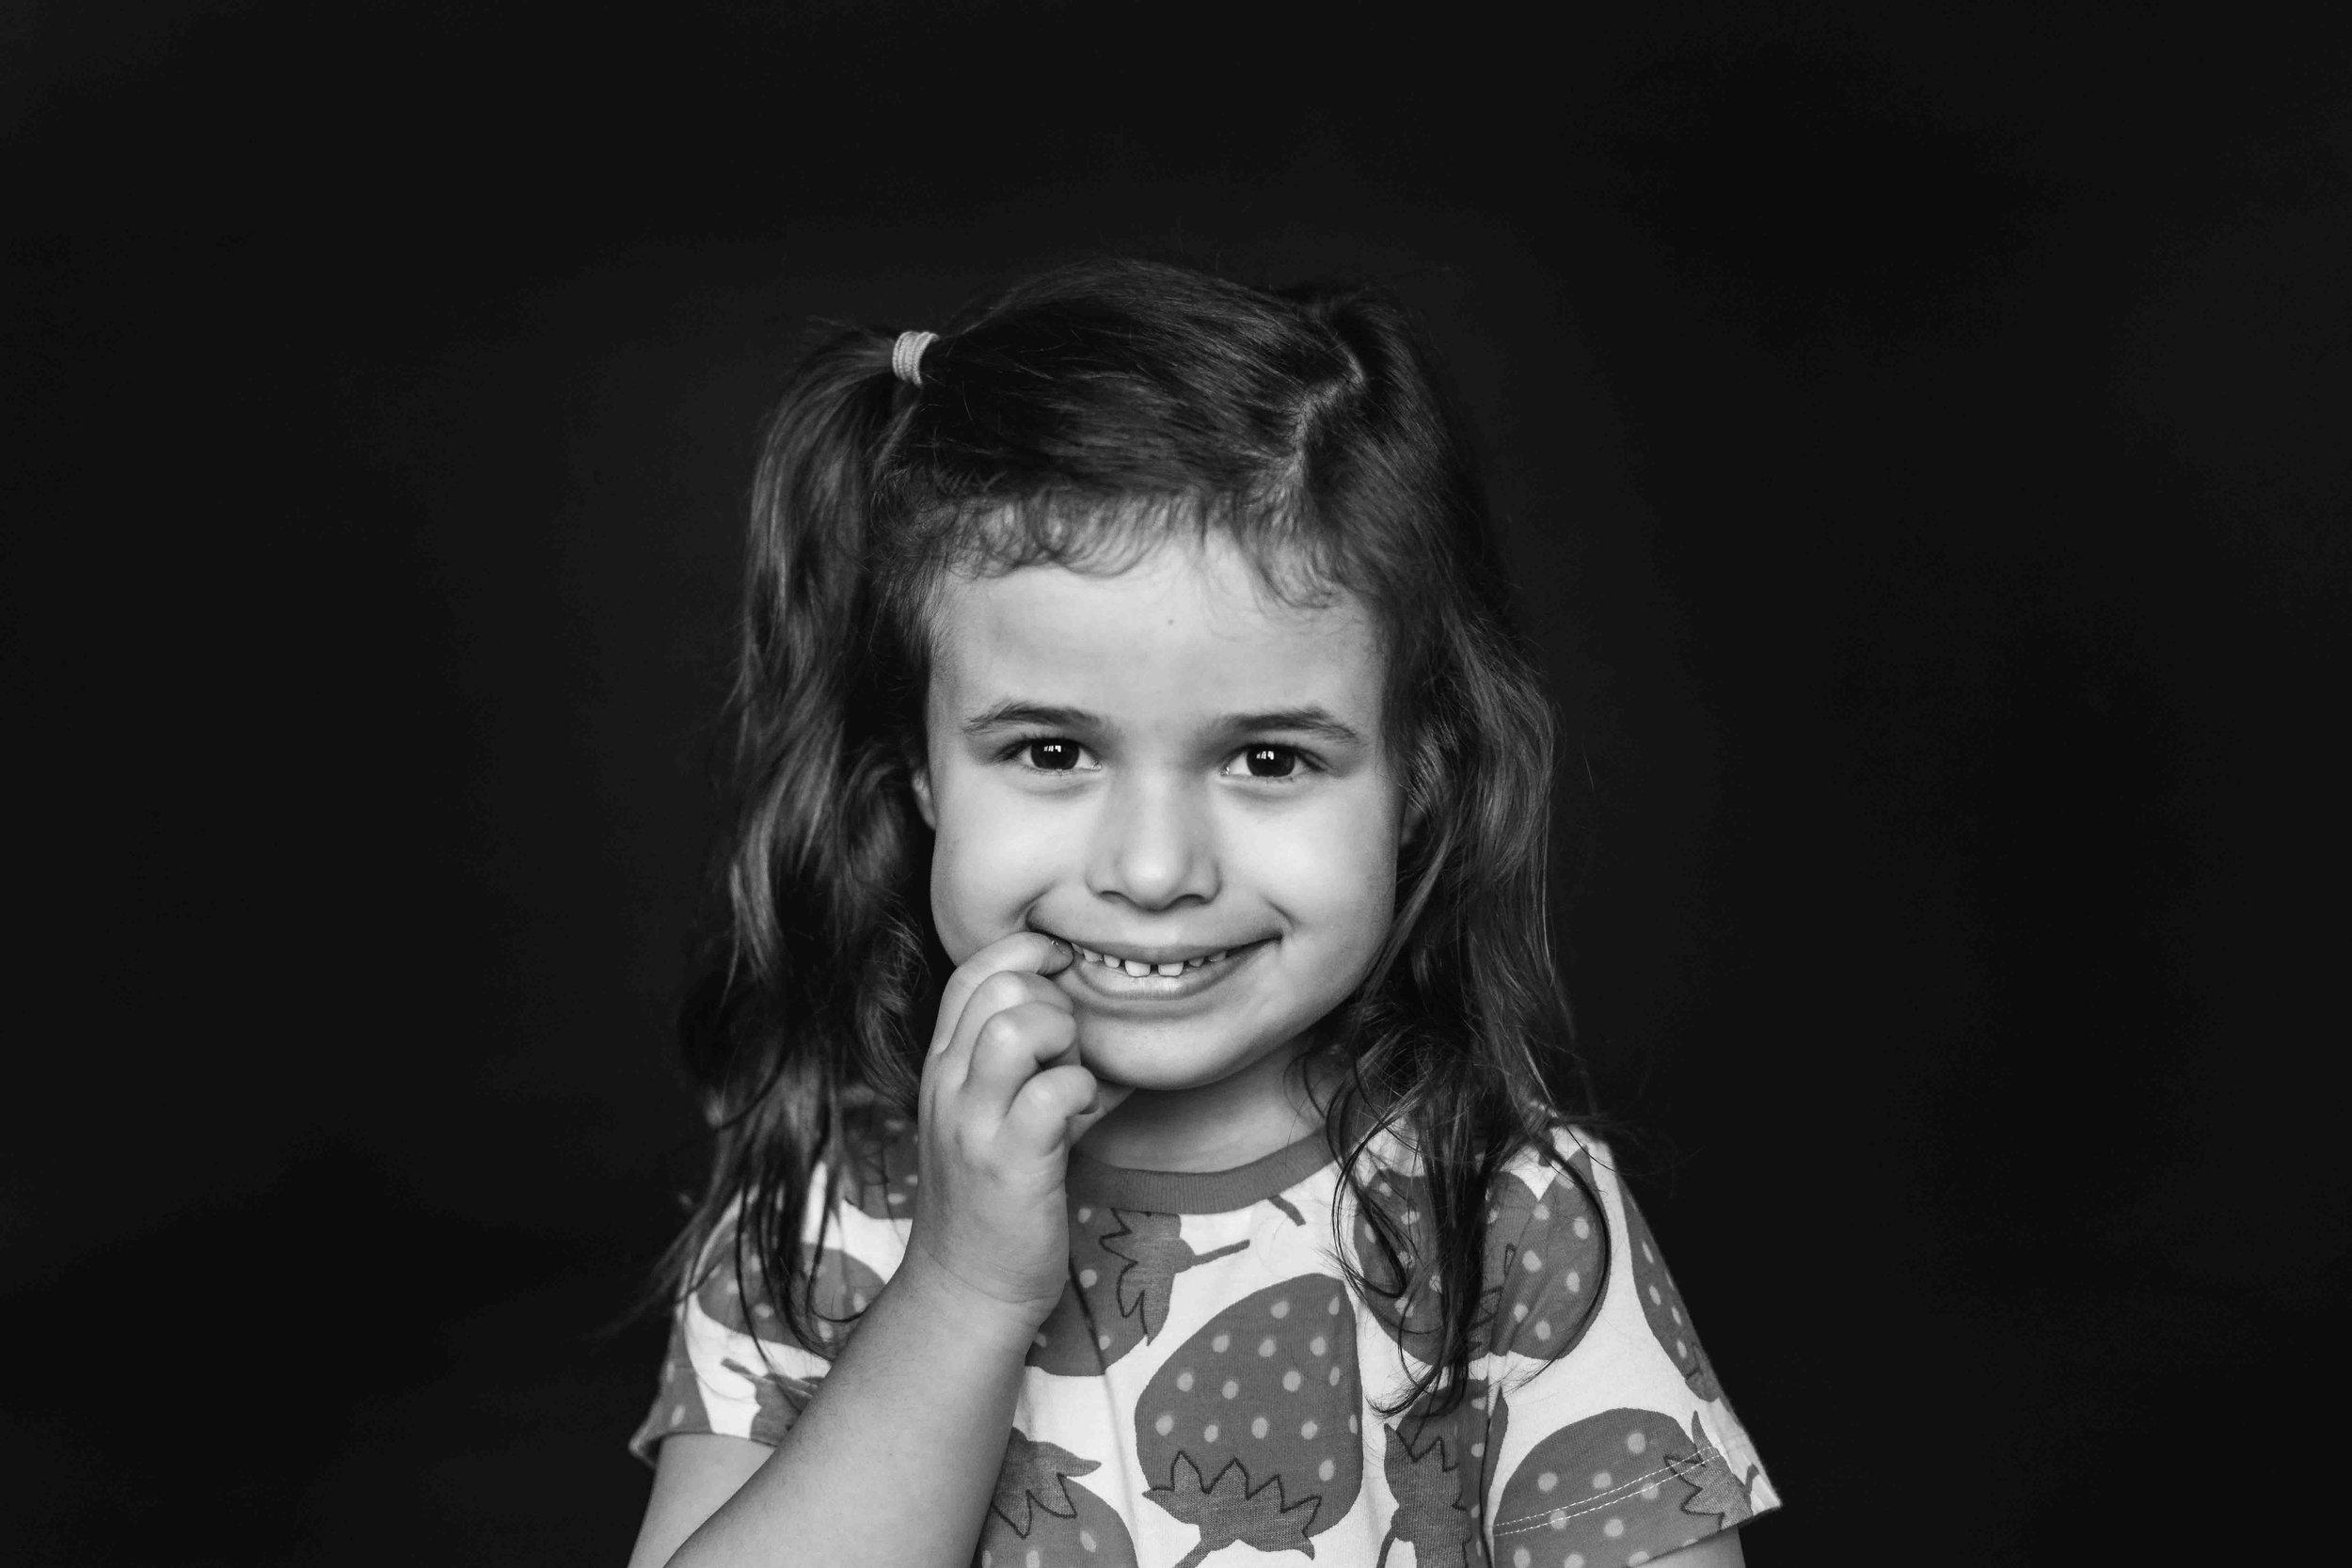 20180919_2391--4yr--3day----406--blackandwhite---416snowflake-pittsburgh-boutique-school-photography.jpg